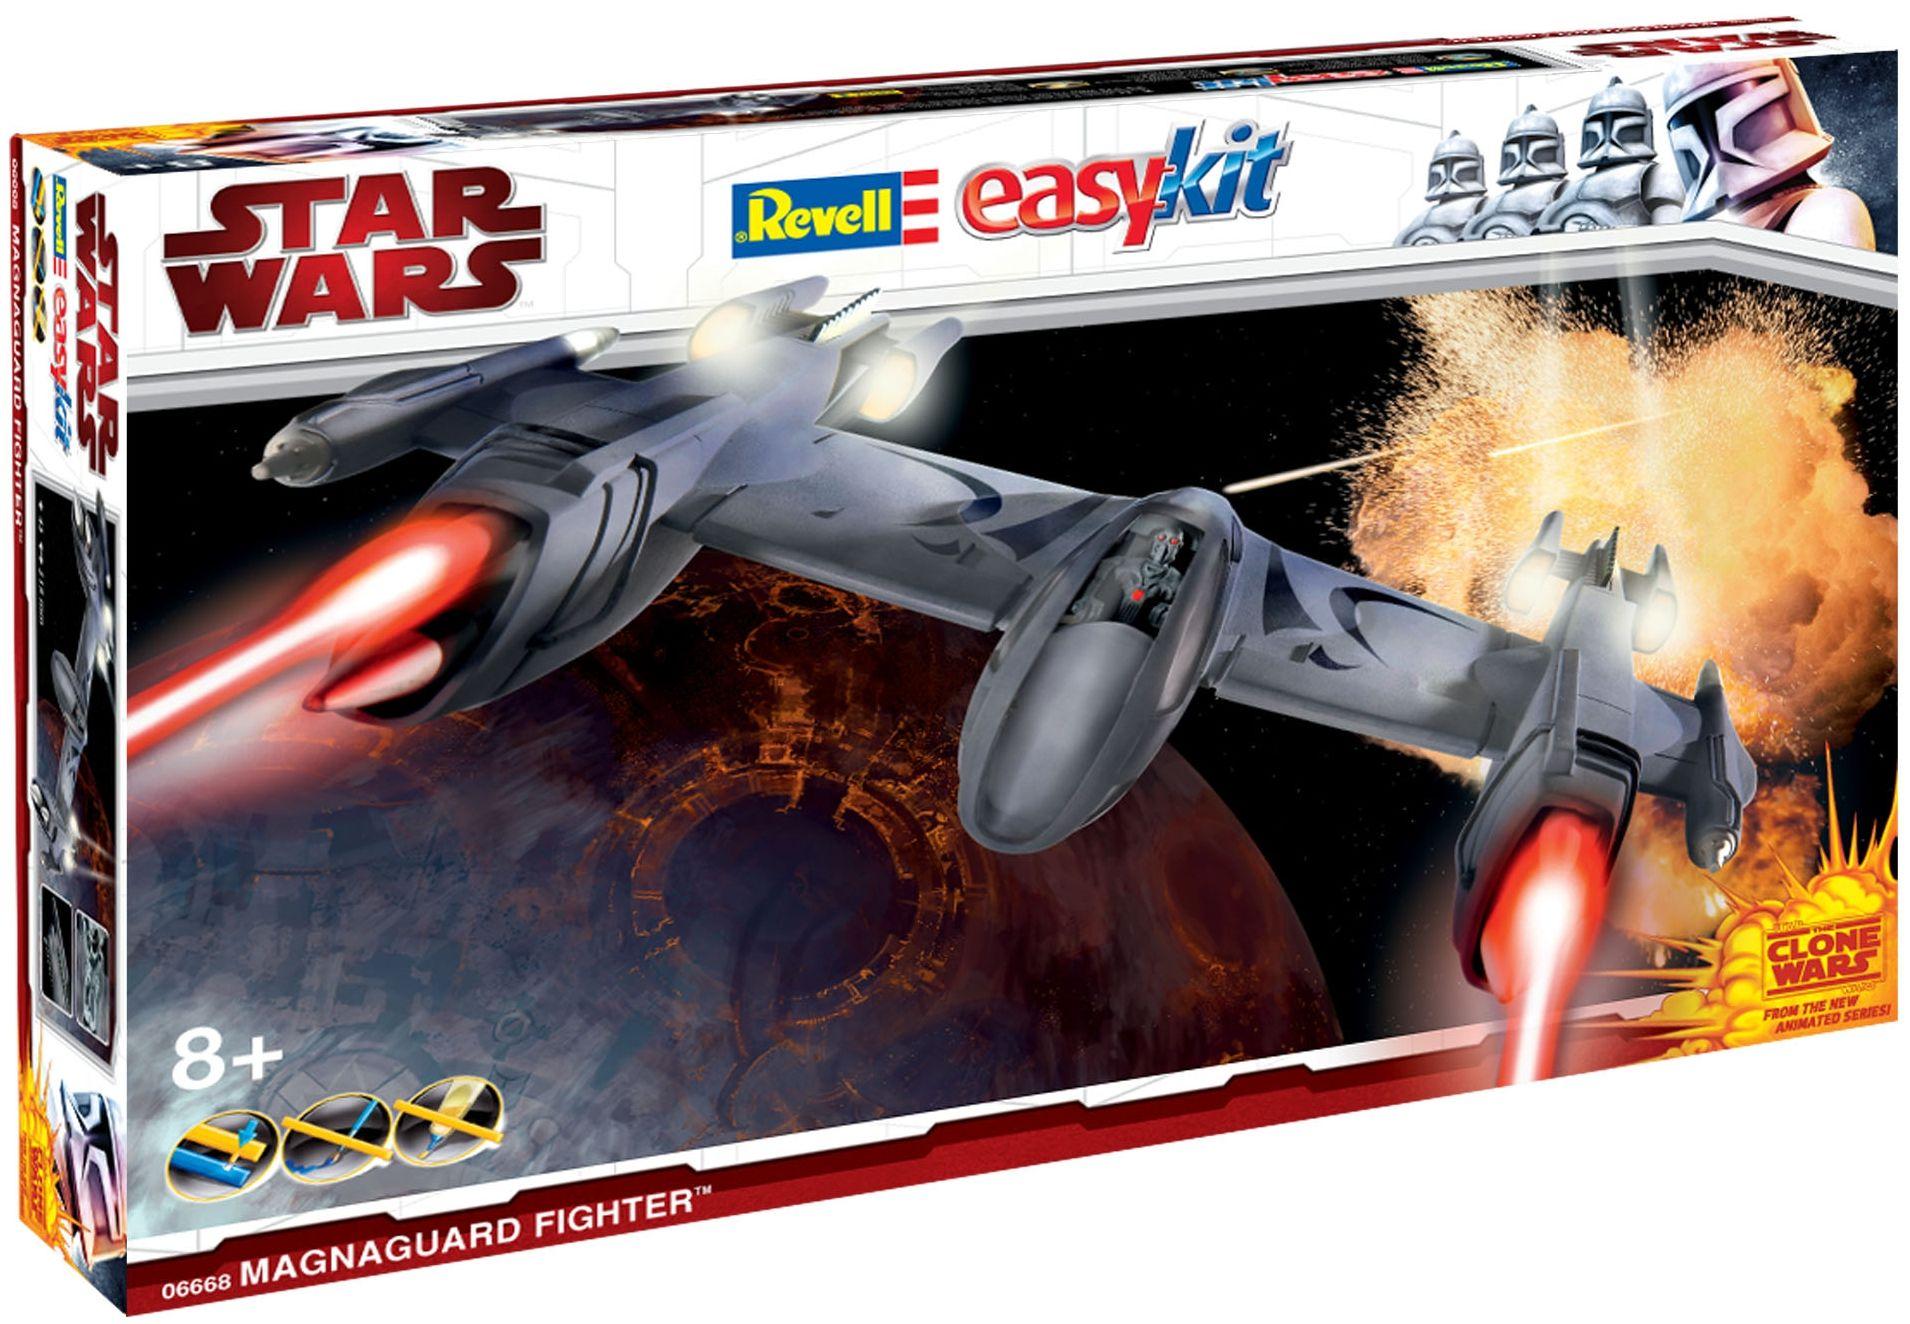 Сглобяем модел на космически кораб Revell Easykit STAR WARS - Magna Guard Fighter (Clone Wars) (06668) - 2